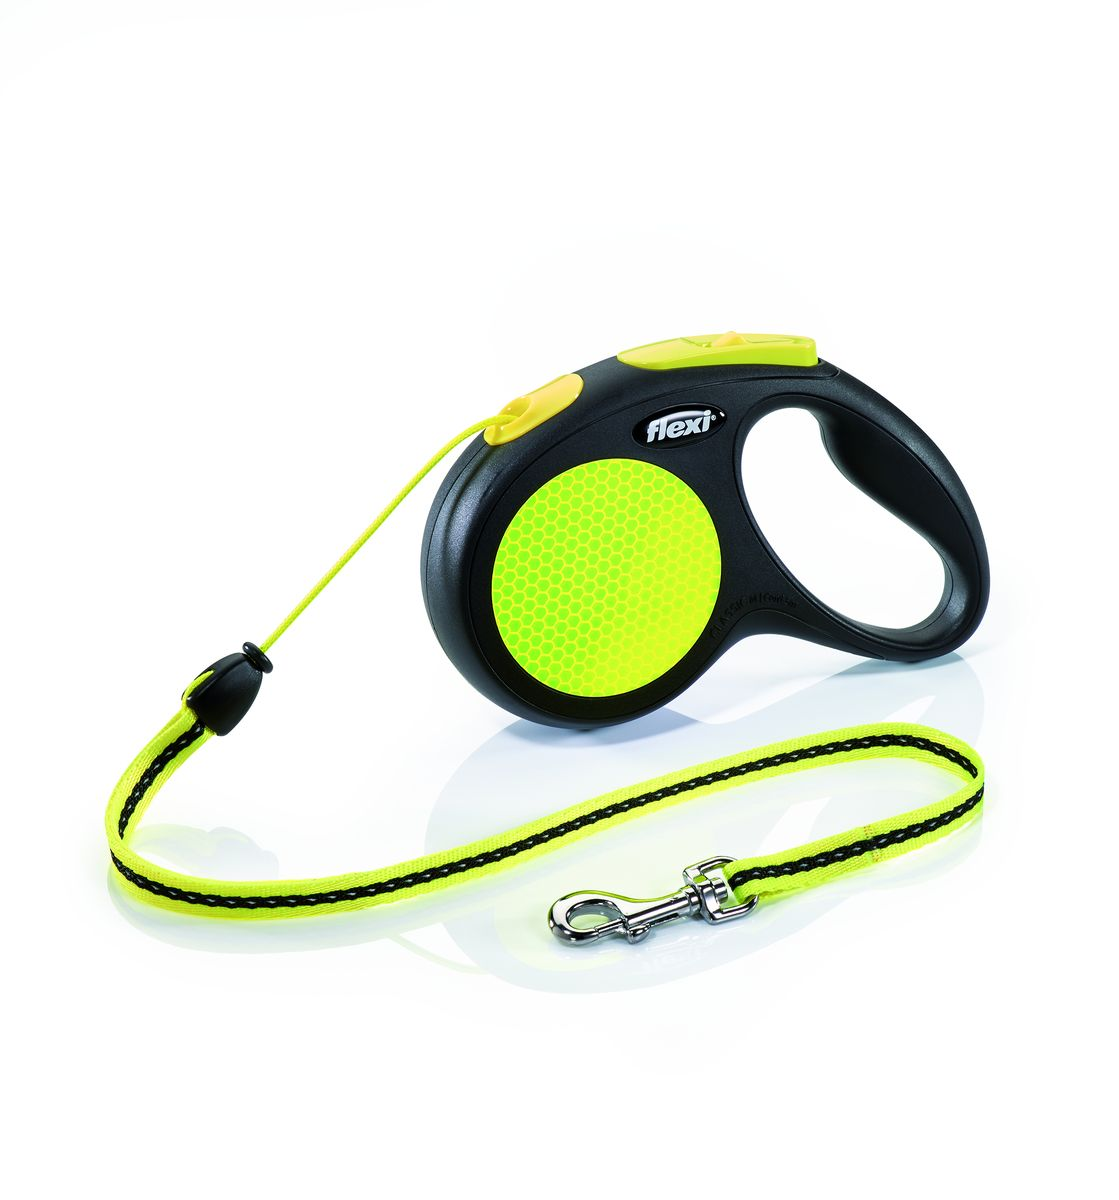 "Поводок-рулетка Flexi ""Neon New Classic М"", трос, для собак весом до 20 кг, 5 м"